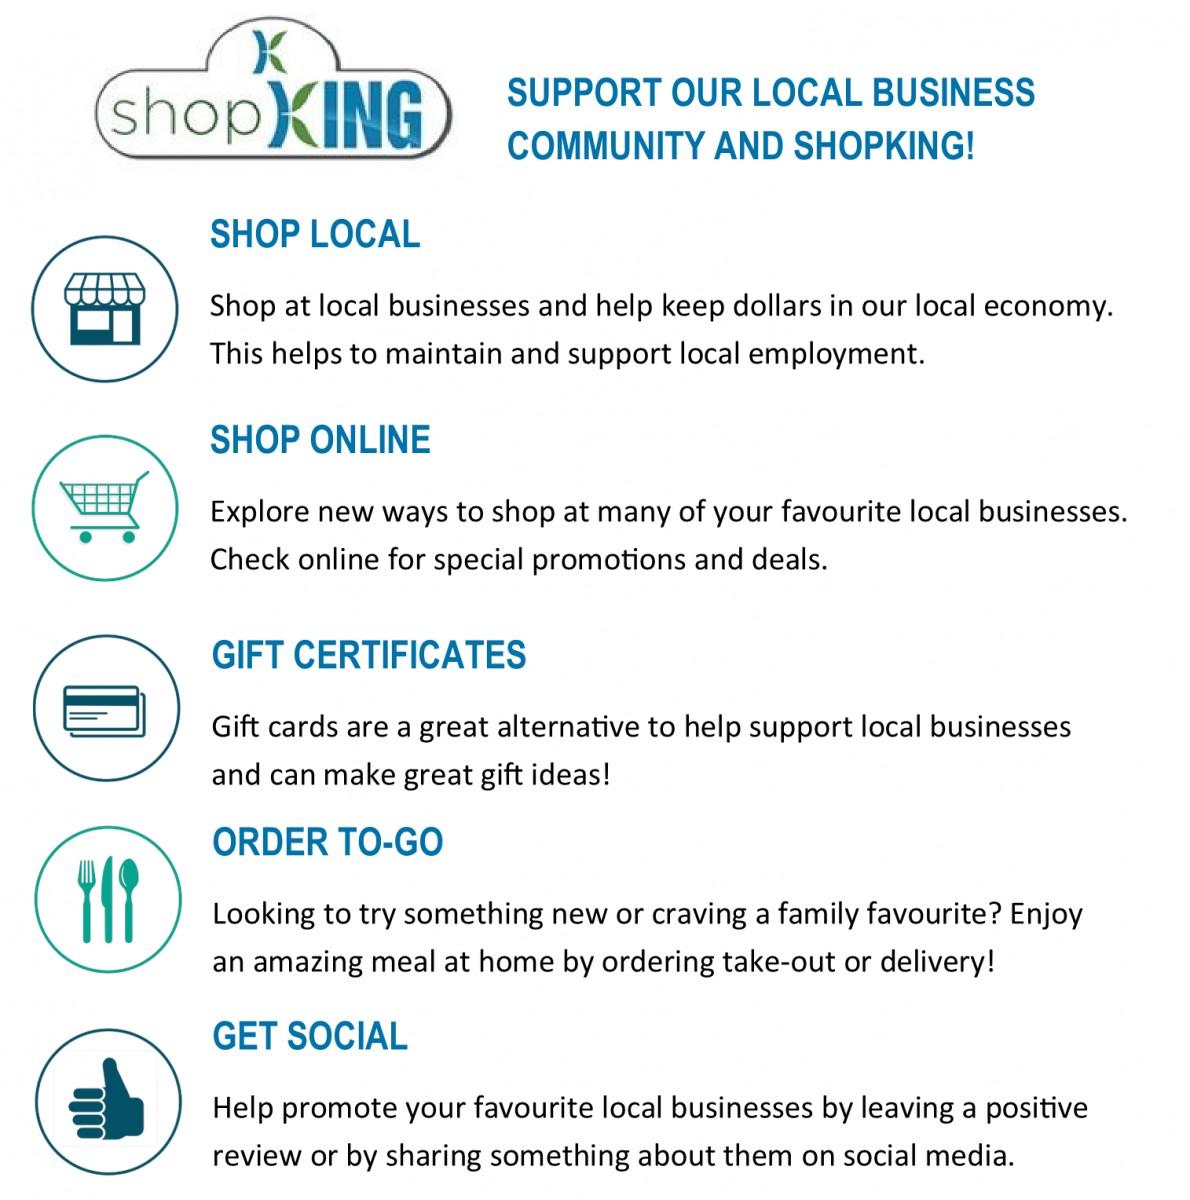 Shop Local image